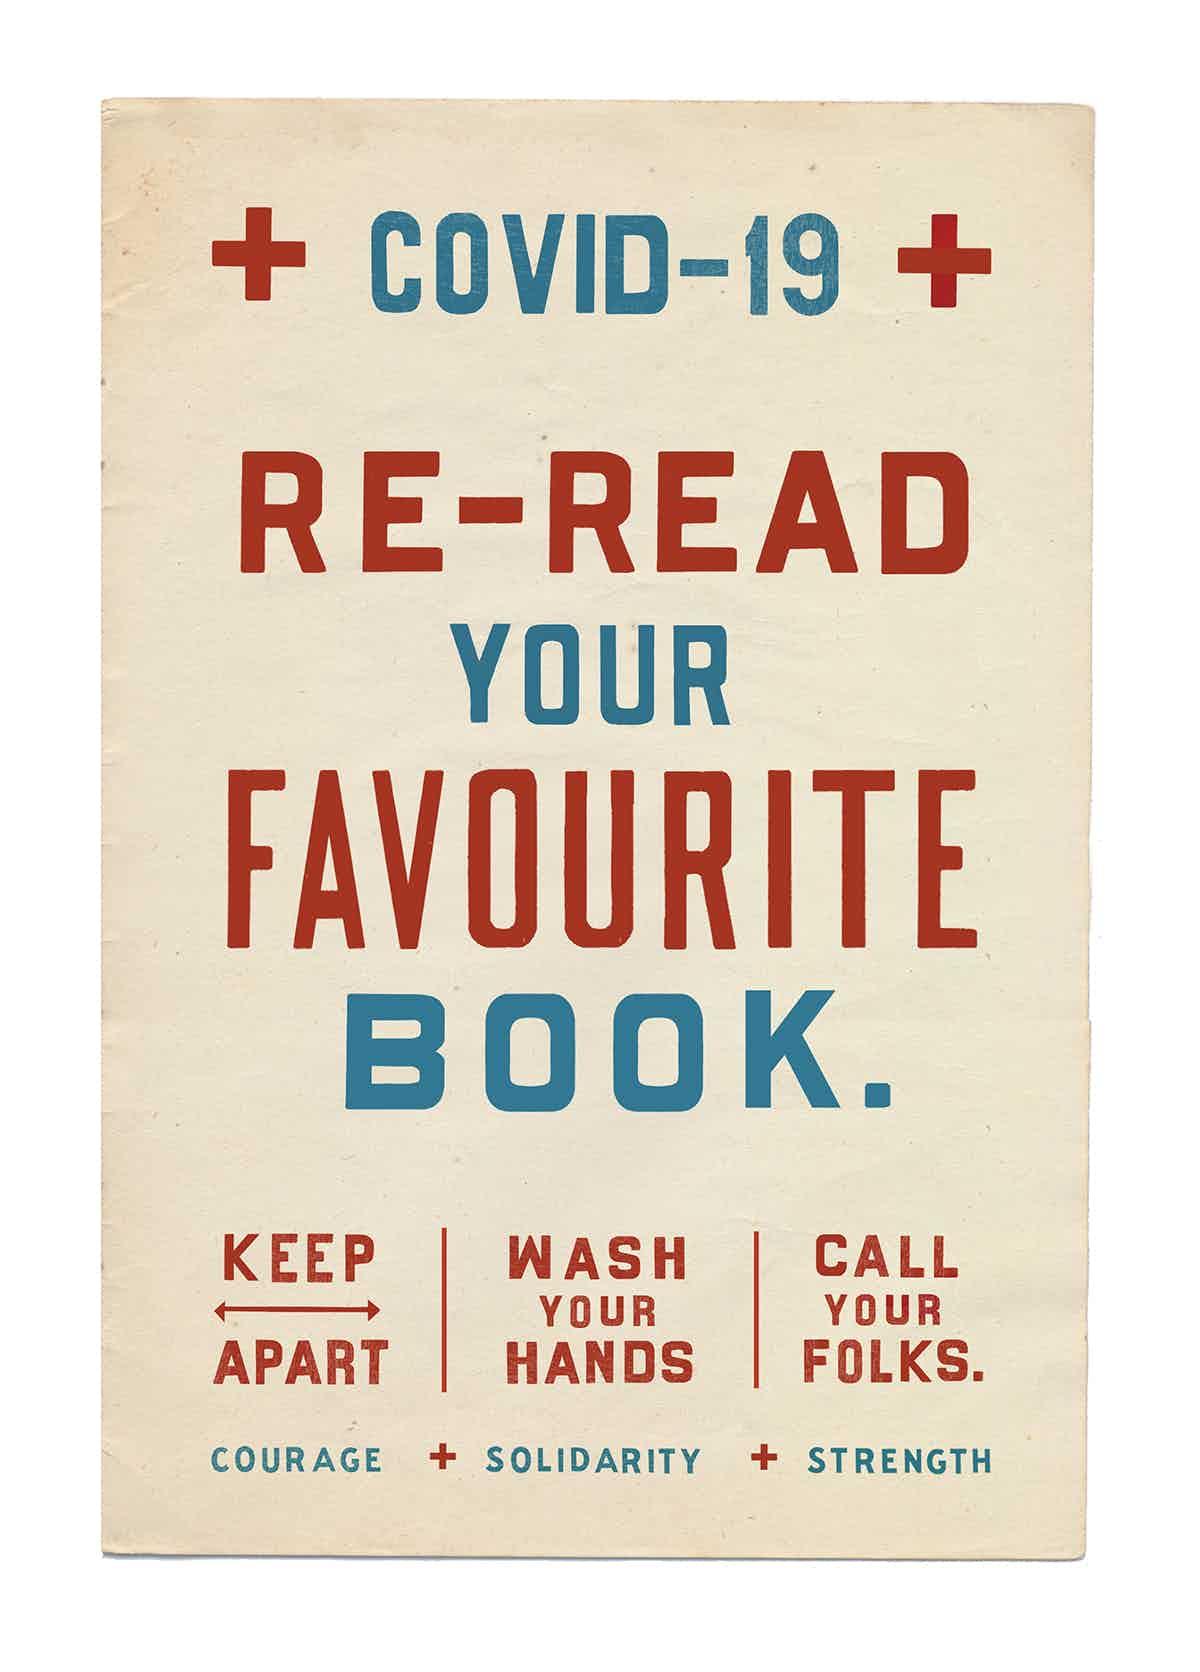 Annie Atkins posters